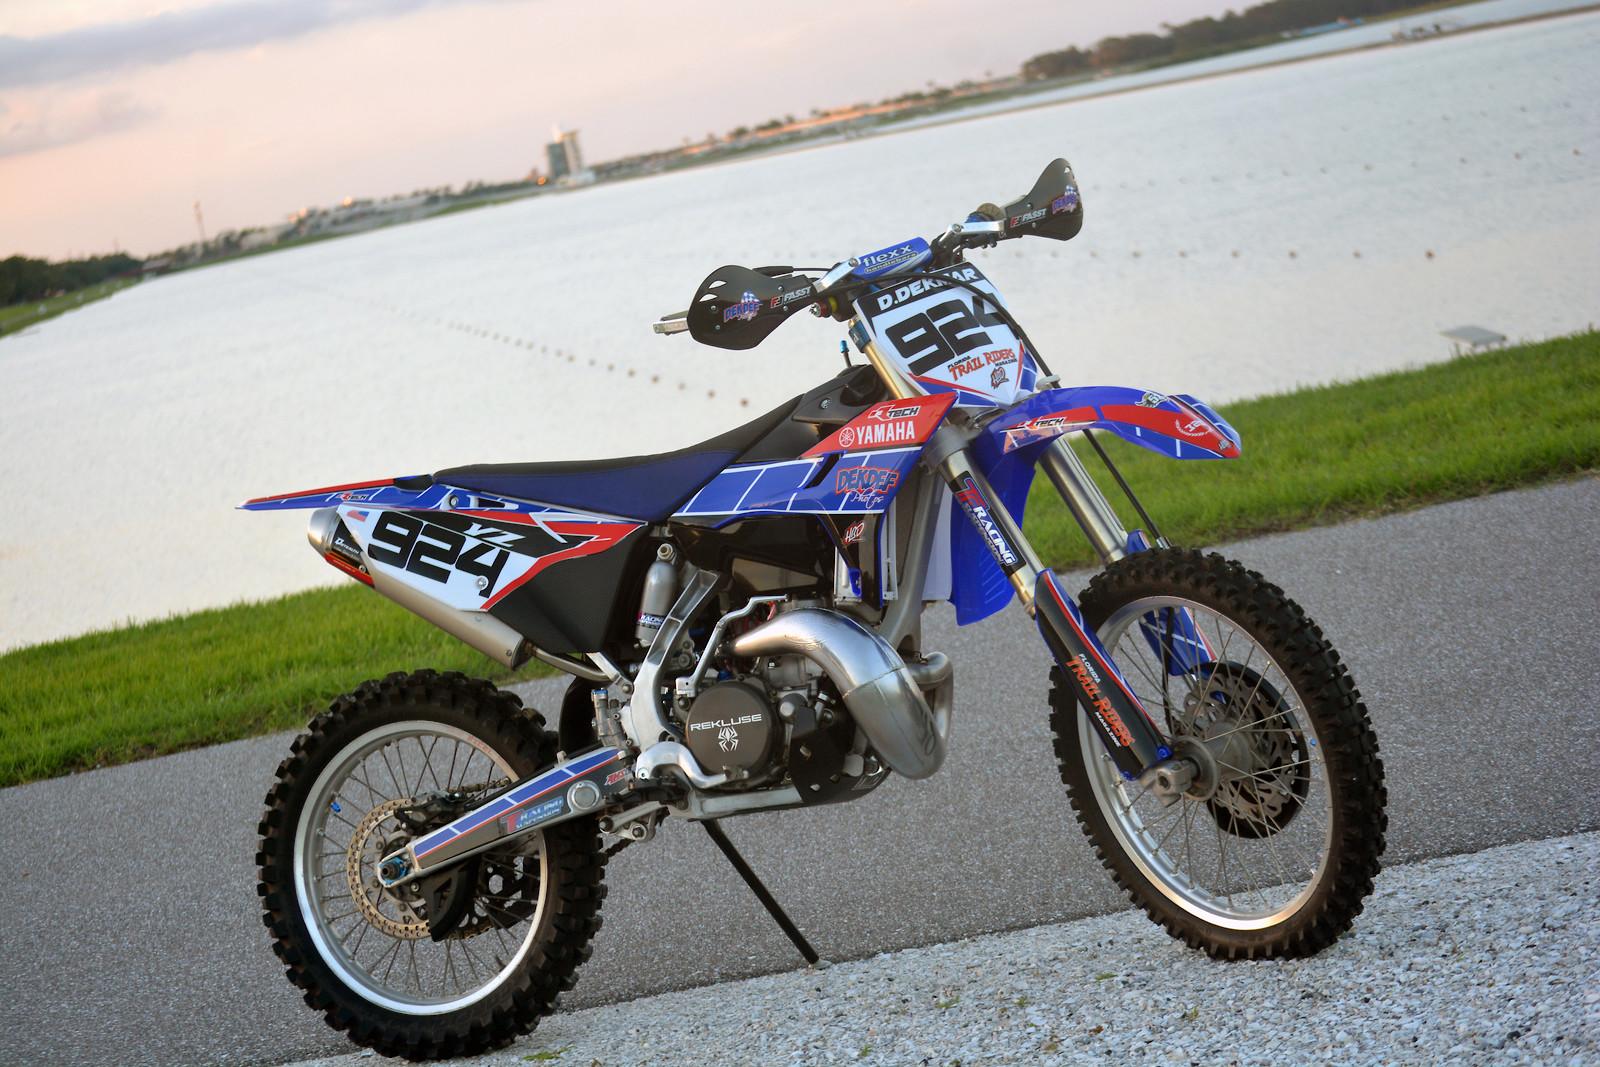 2005 YZ250